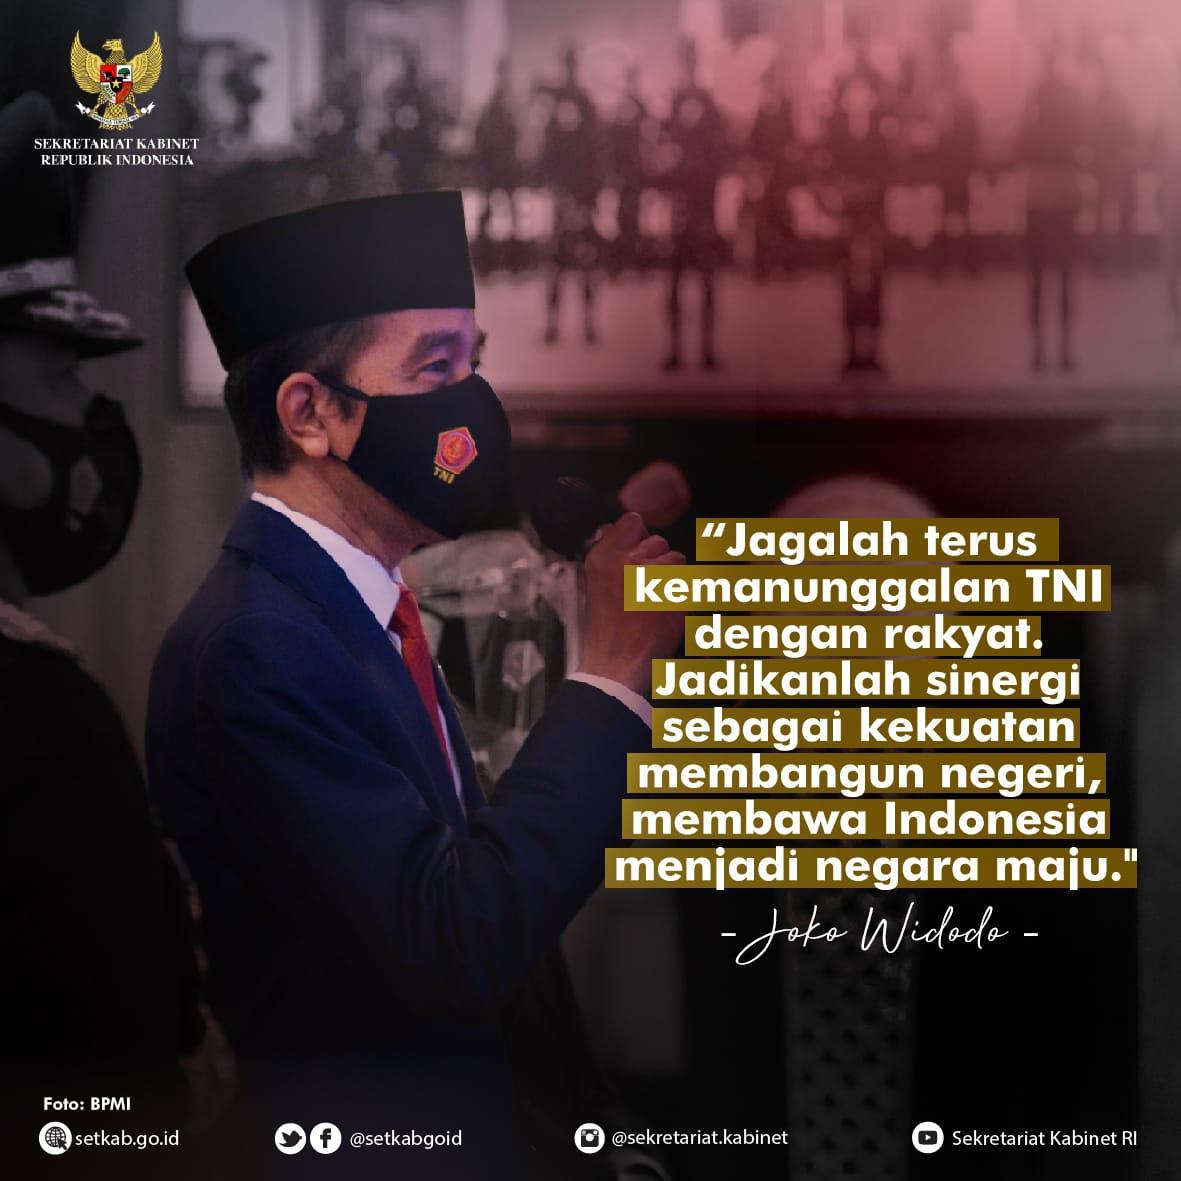 Sambutan Presiden Joko Widodo pada HUT ke-75 TNI